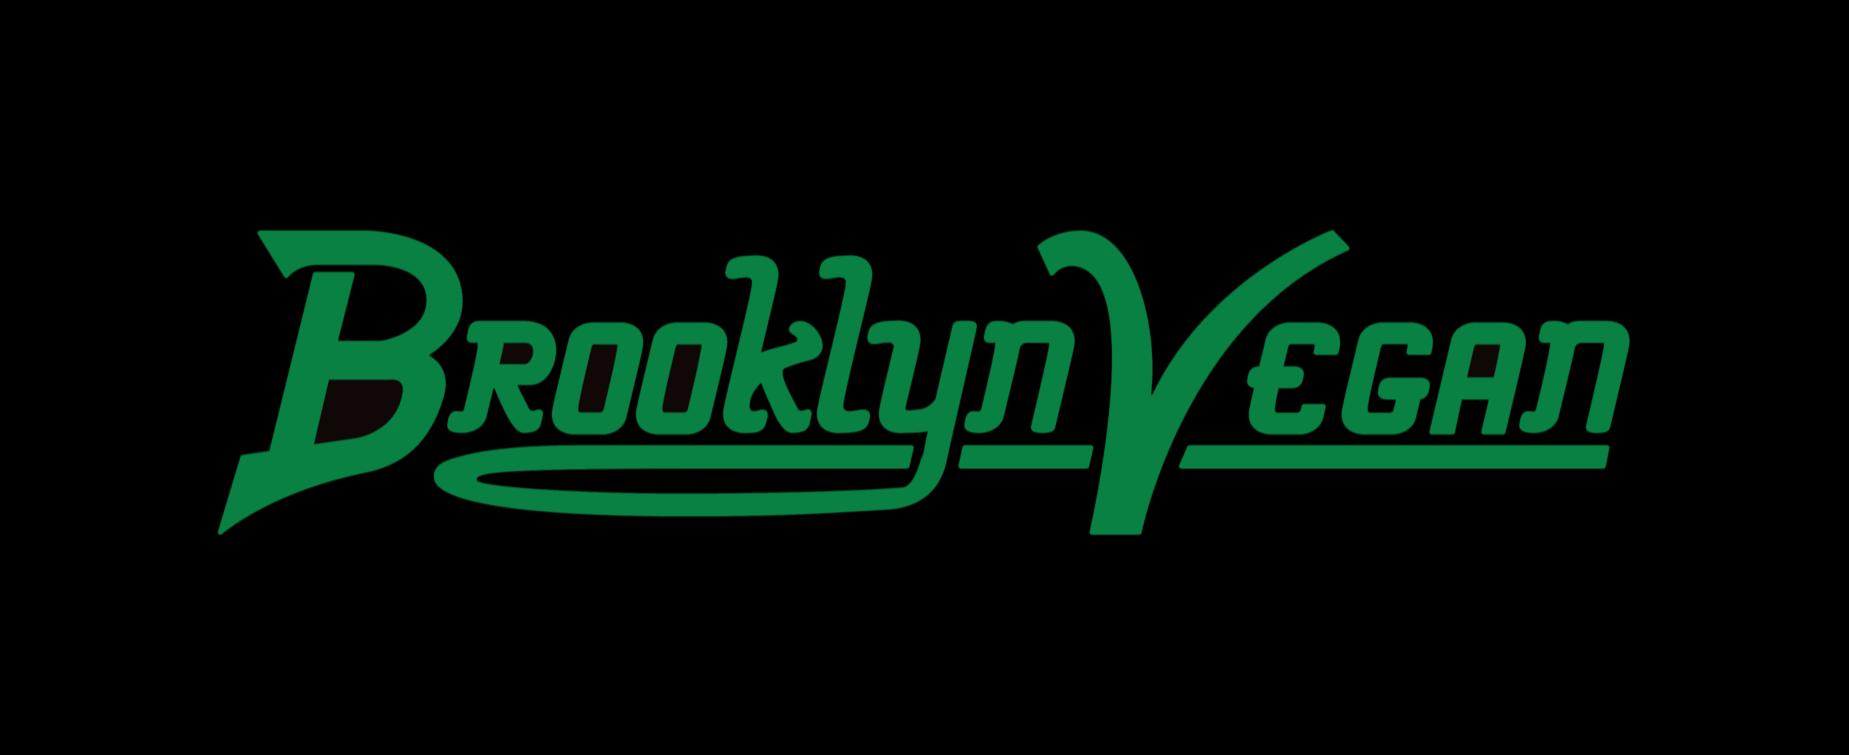 BrooklynVeganLogUpdated.png